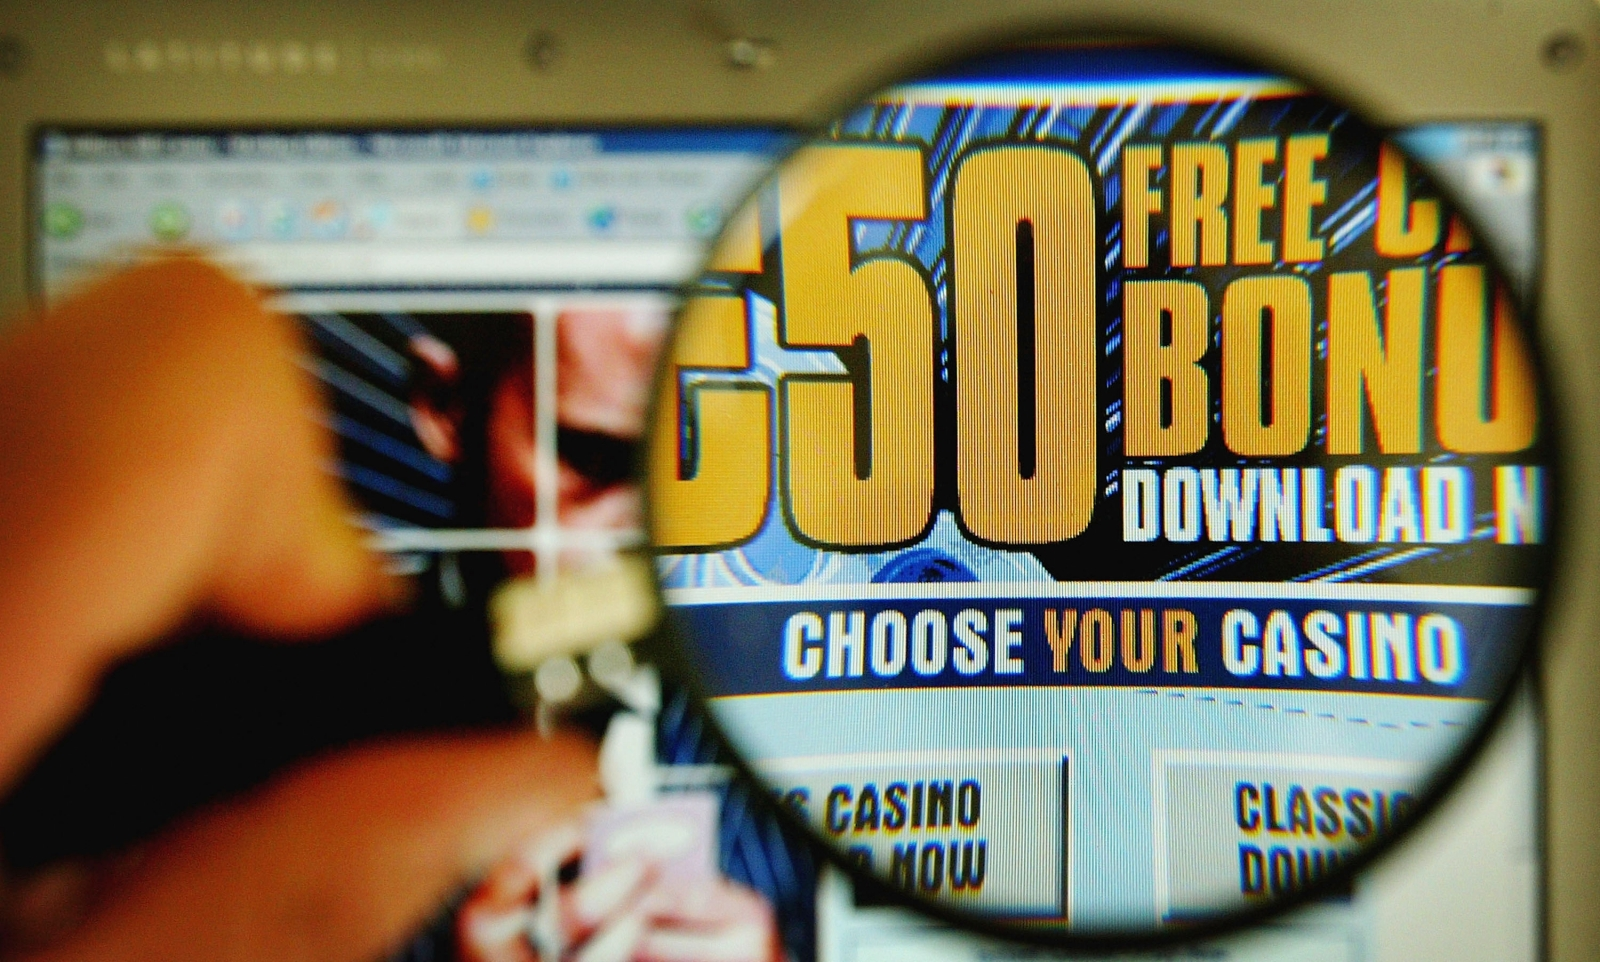 Philippines online gambling illegal casino cruise in jacksonville